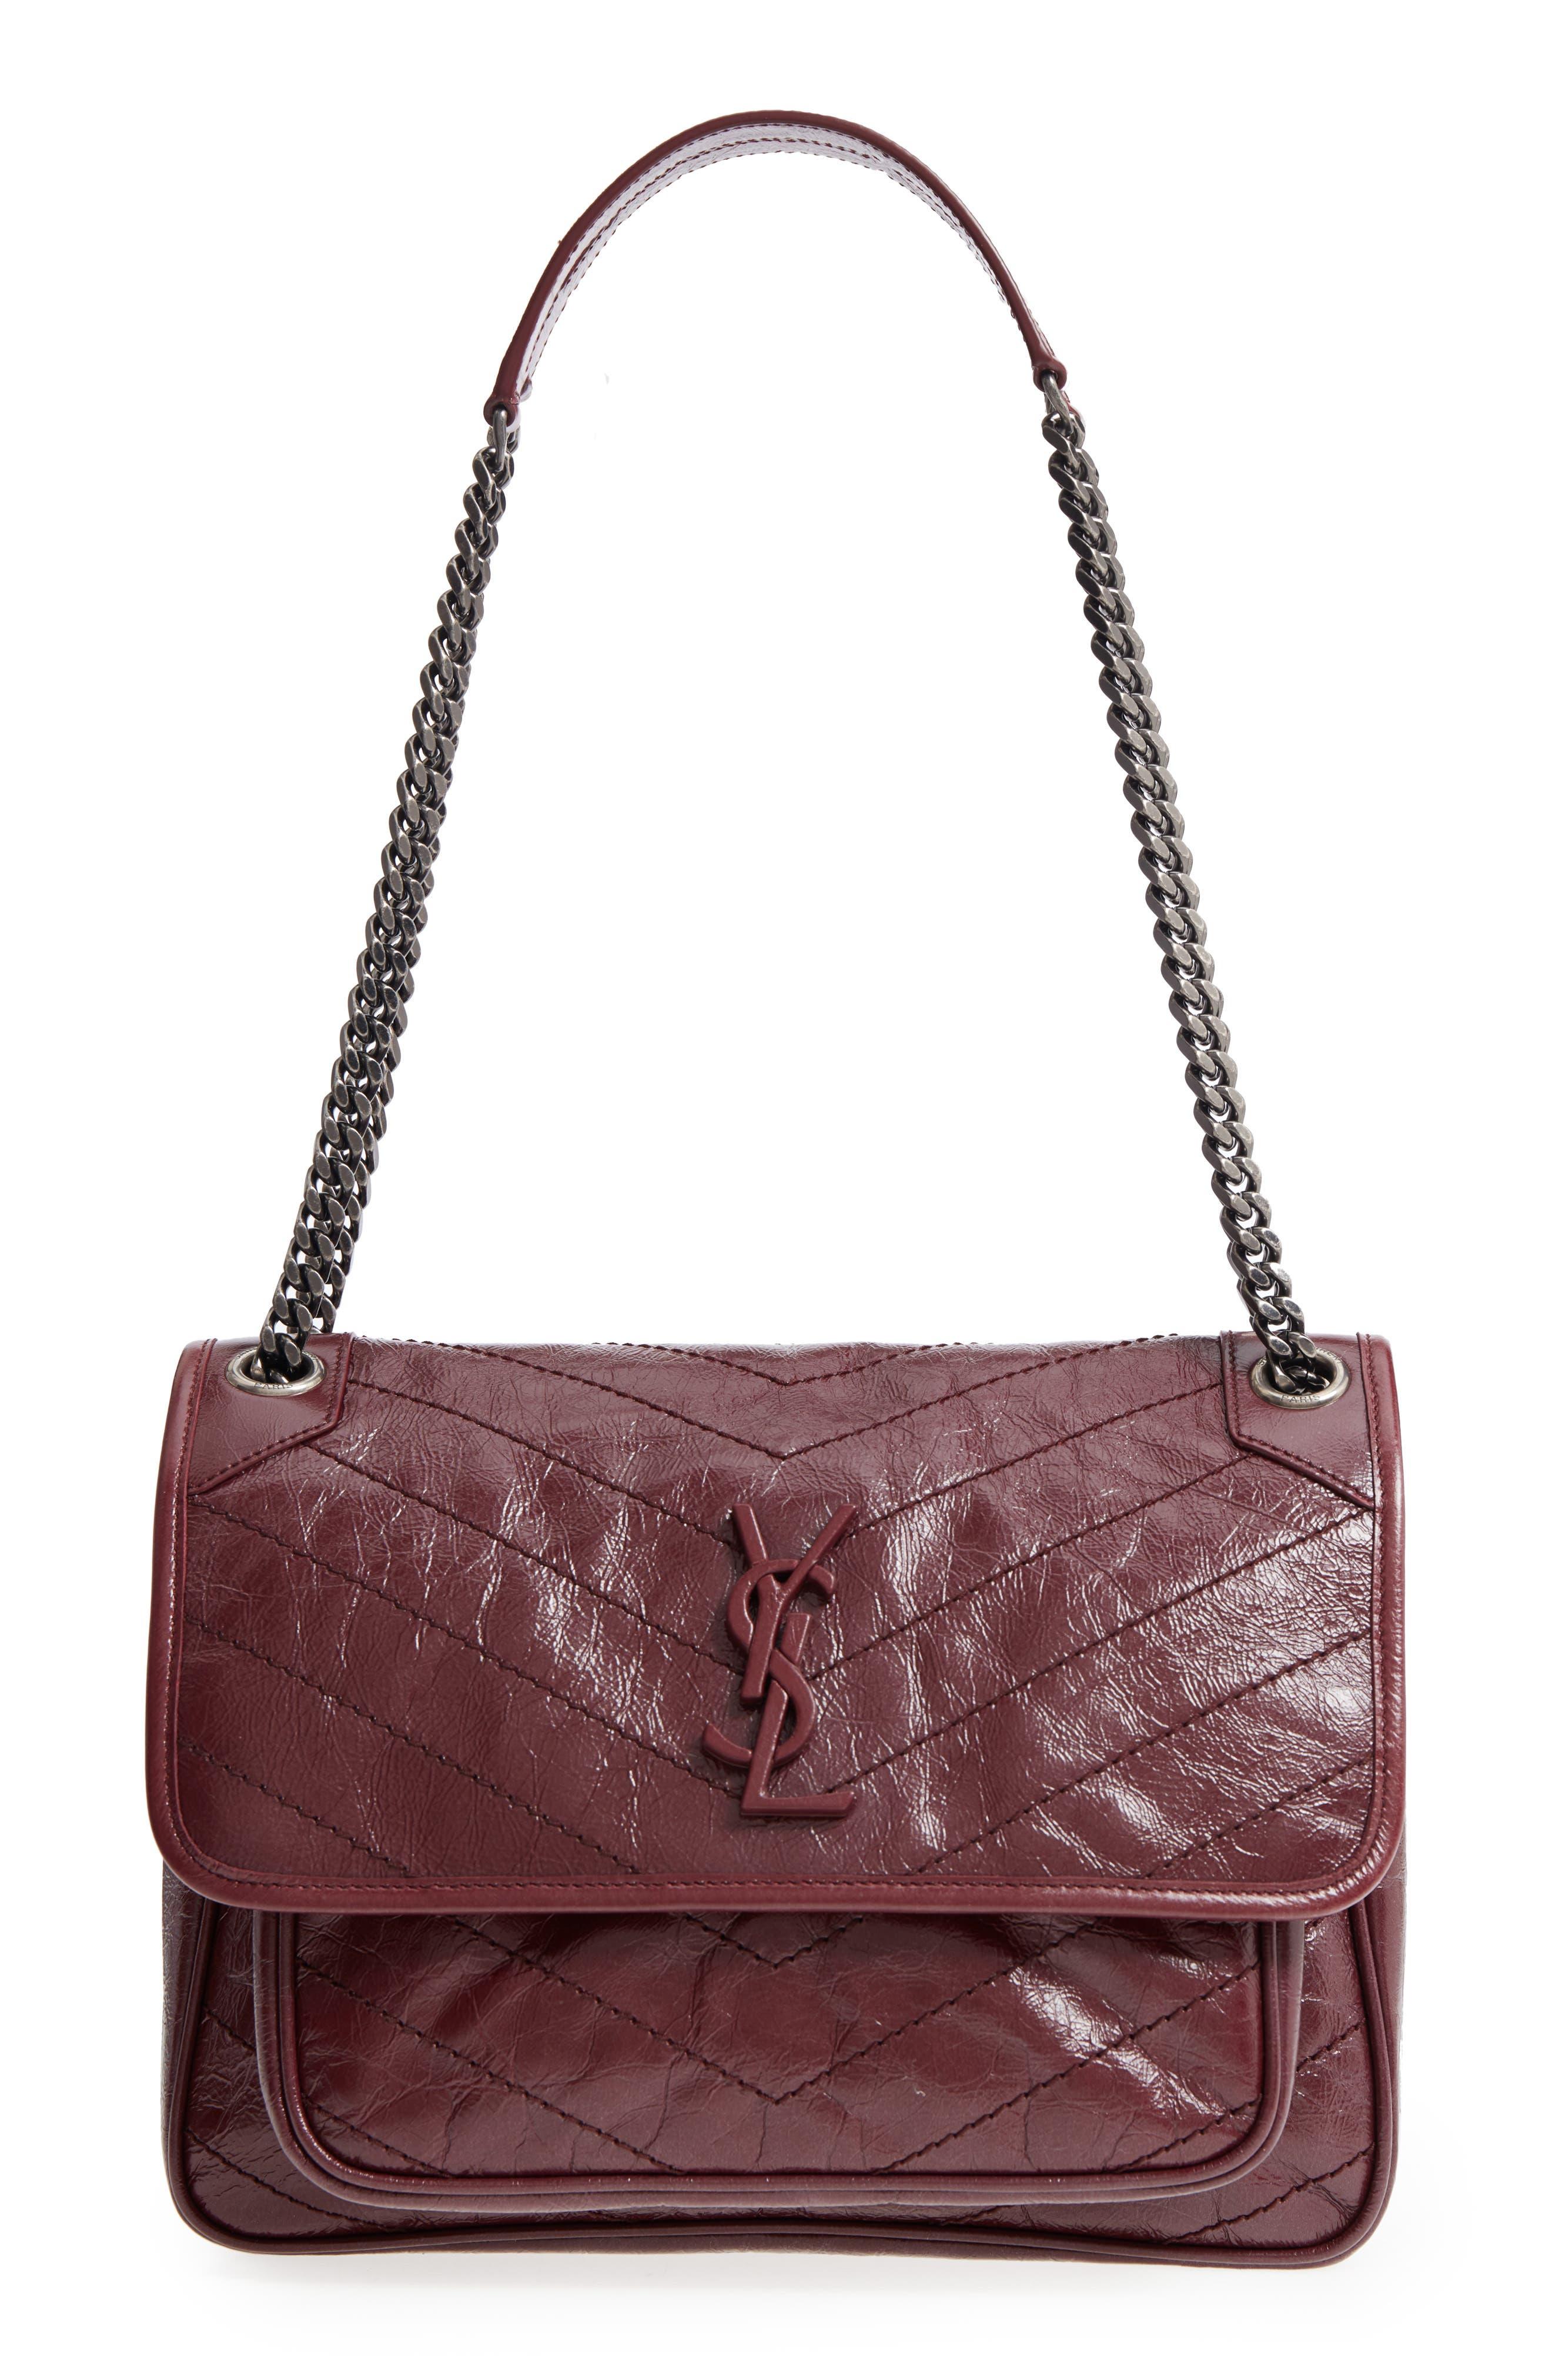 Medium Niki Leather Shoulder Bag,                             Main thumbnail 1, color,                             Rouge Legion